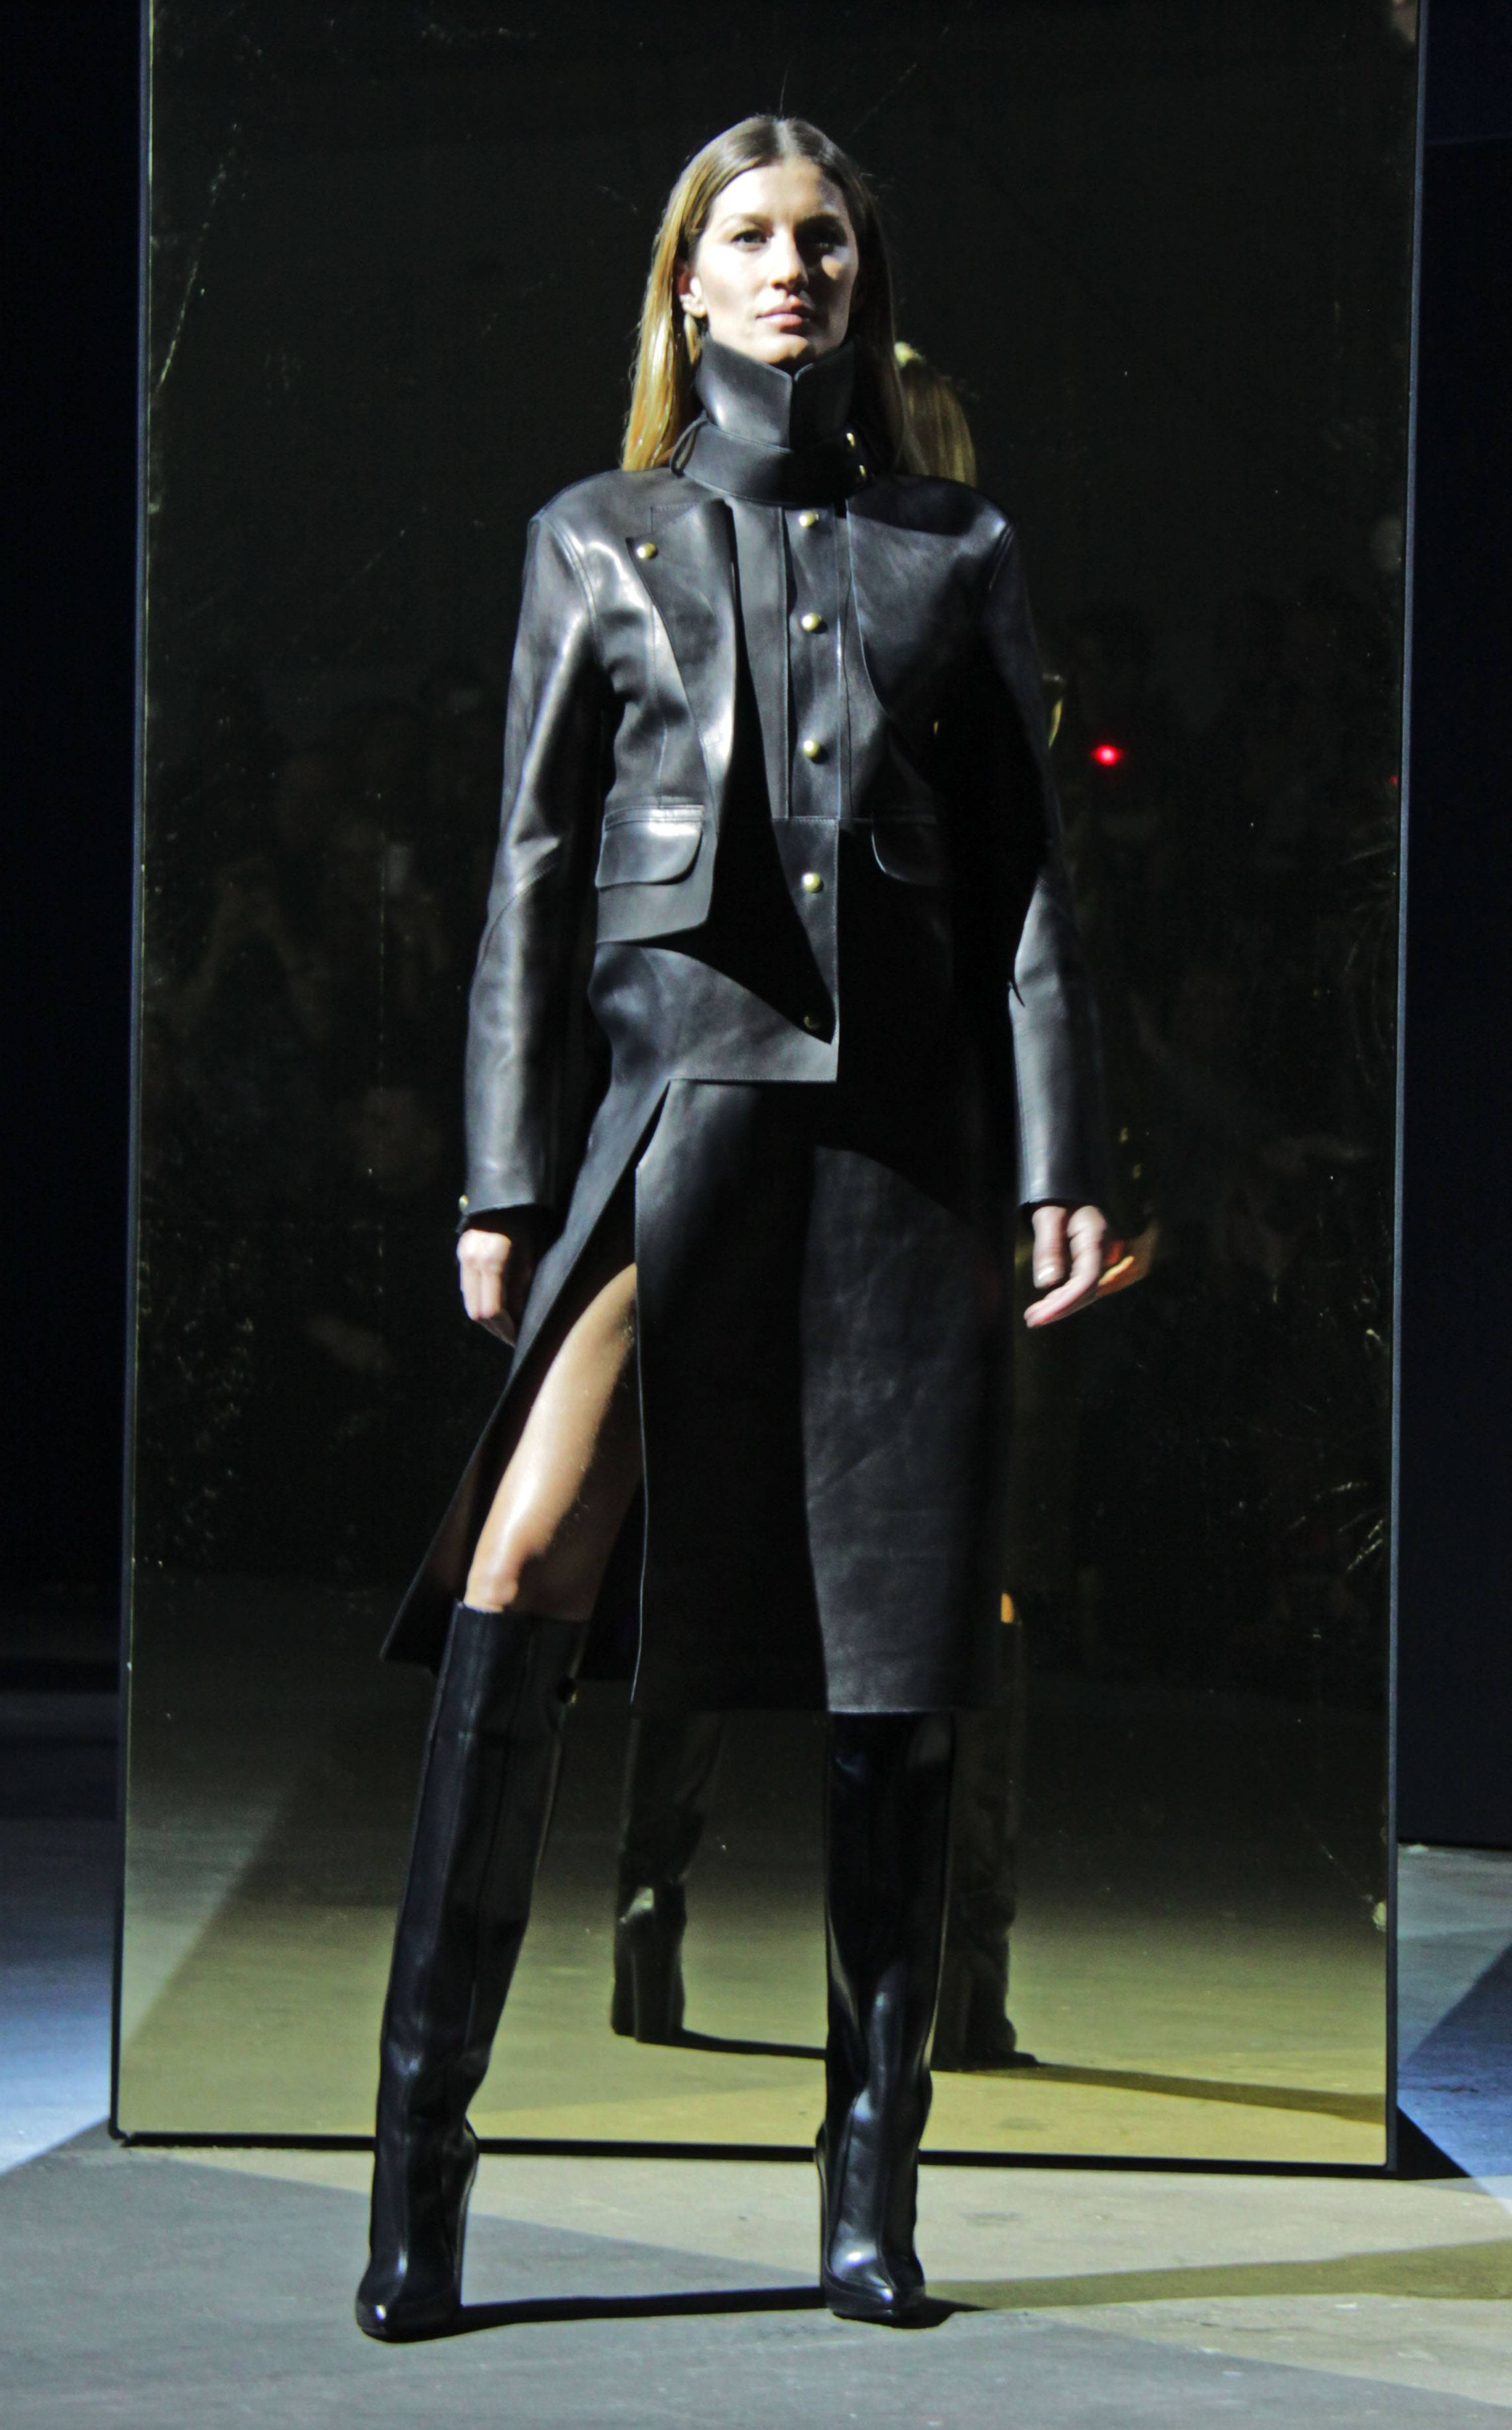 mercedes-benz-fashion-alexander-wang-celebutopia-CD0211201204.jpg